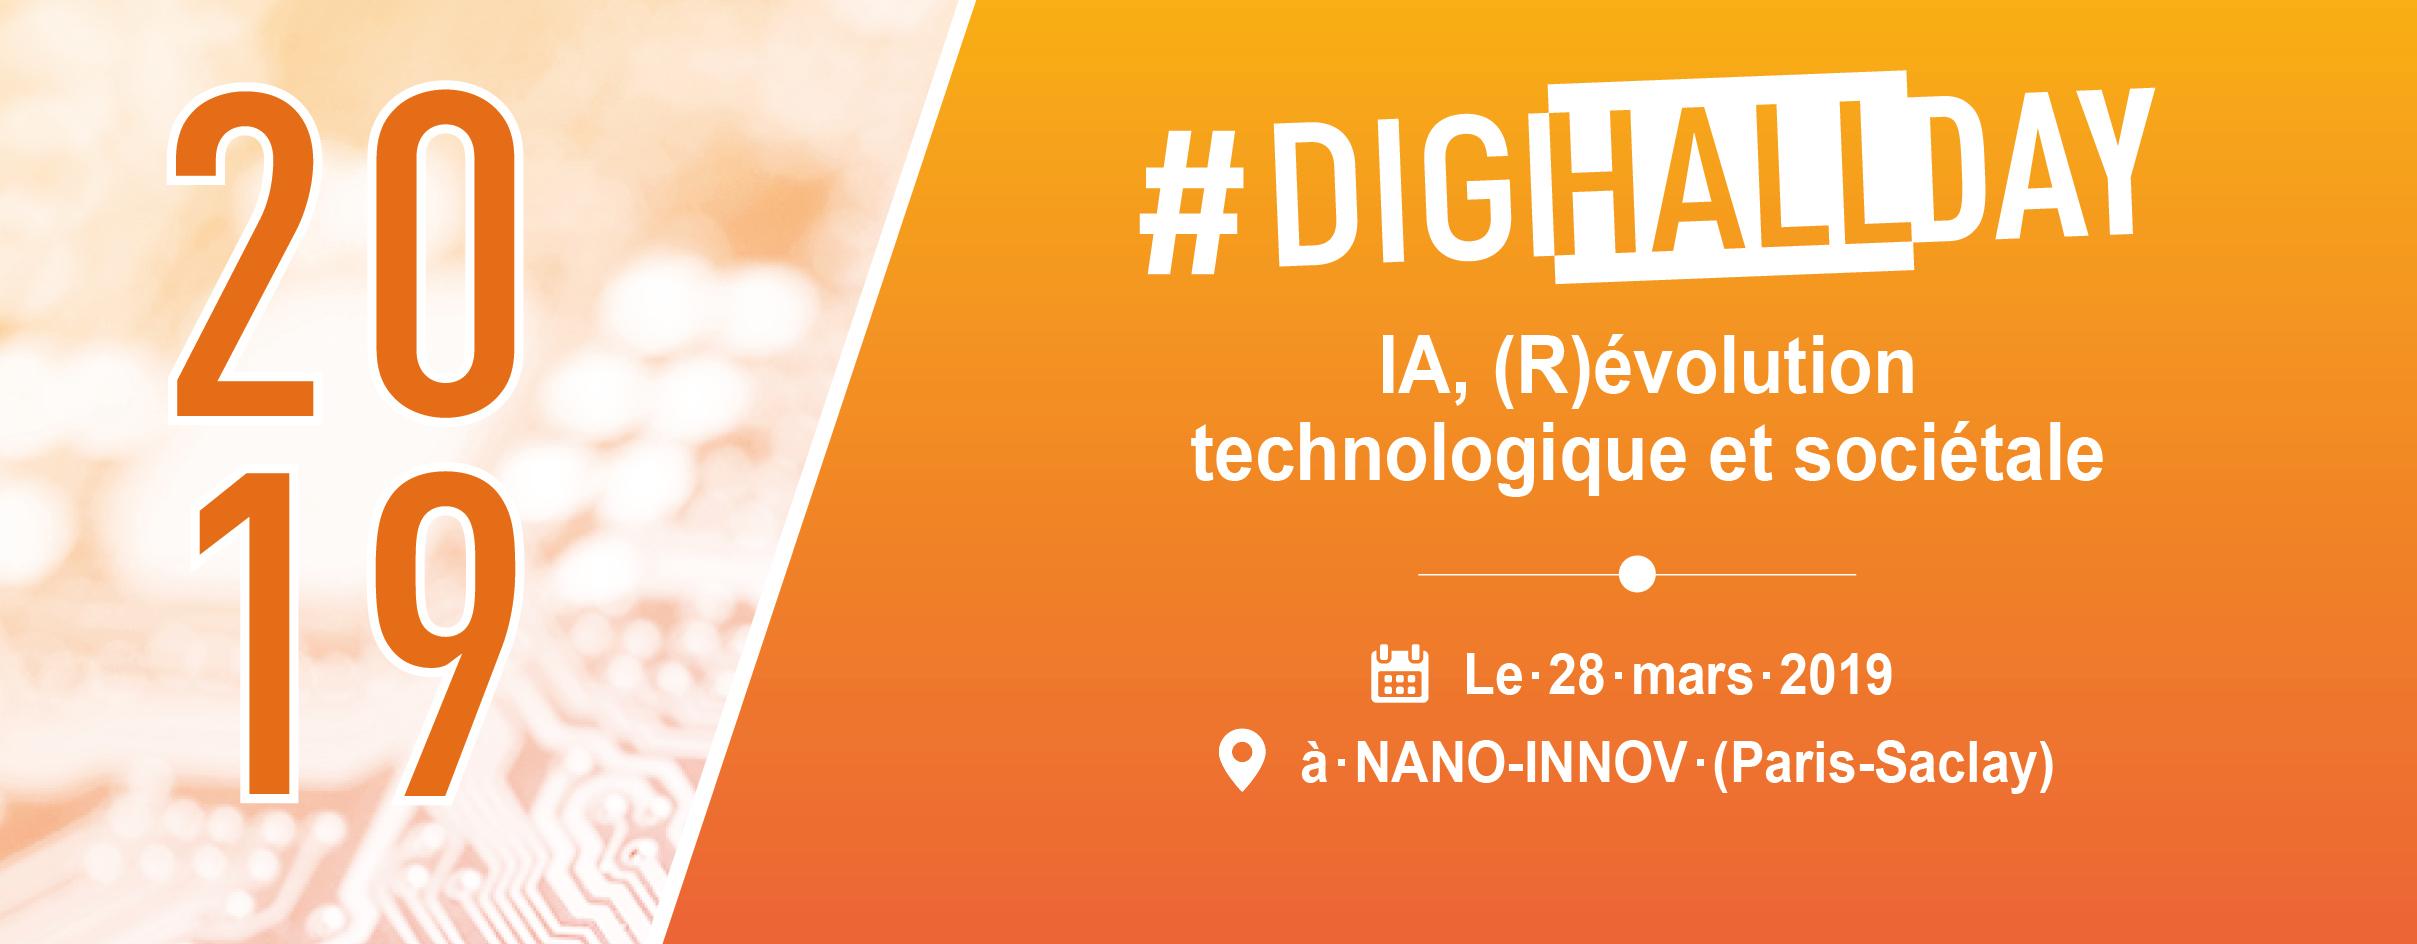 DigiHall Day 2019: IA, a technological and societal (r)evolution